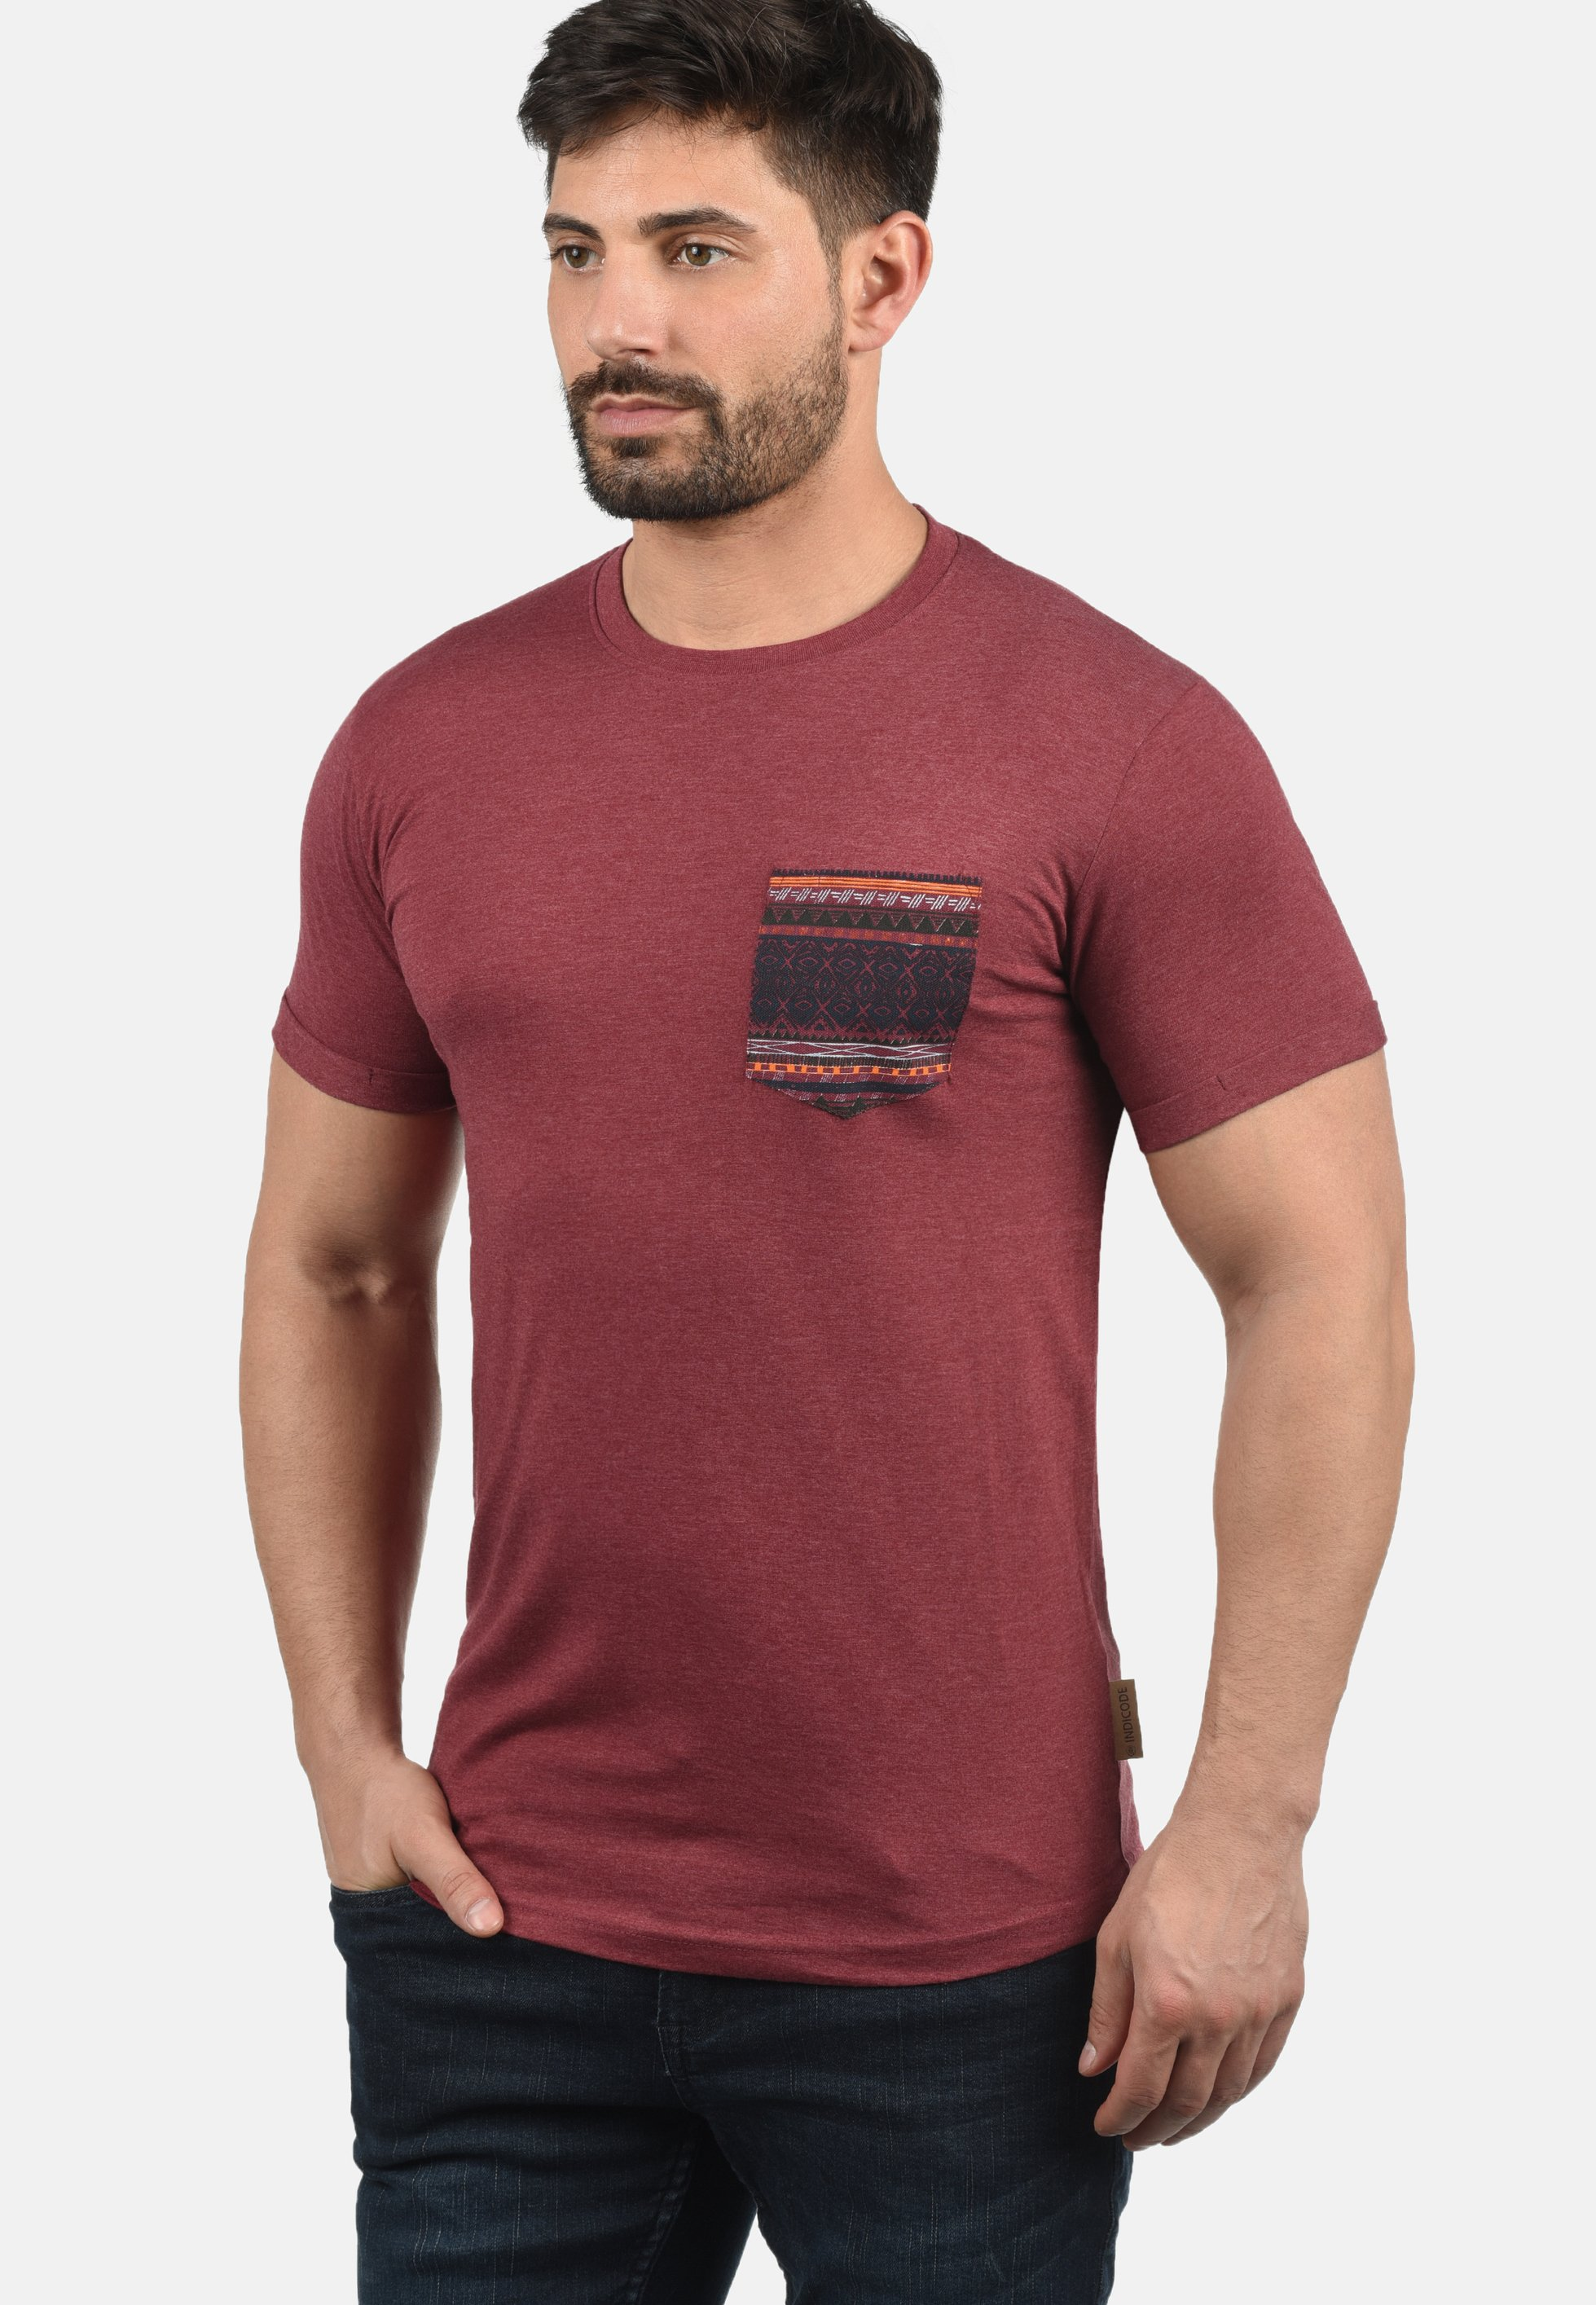 Uomo PAXTON - T-shirt con stampa